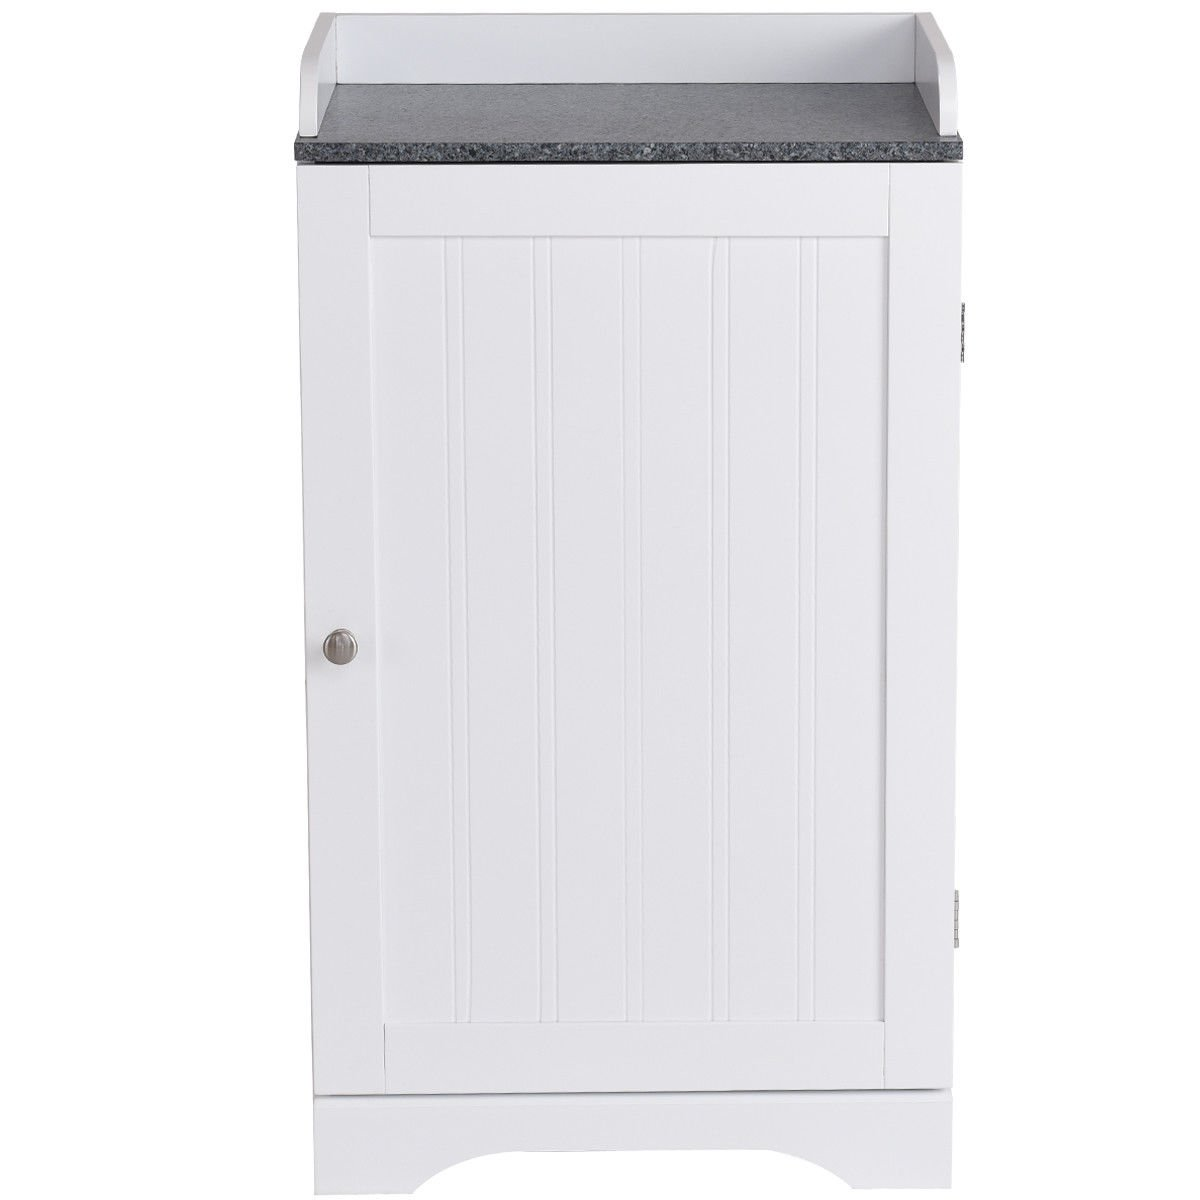 White Wood Bathroom Floor Cabinet w/ 2 Adjustable Shelves